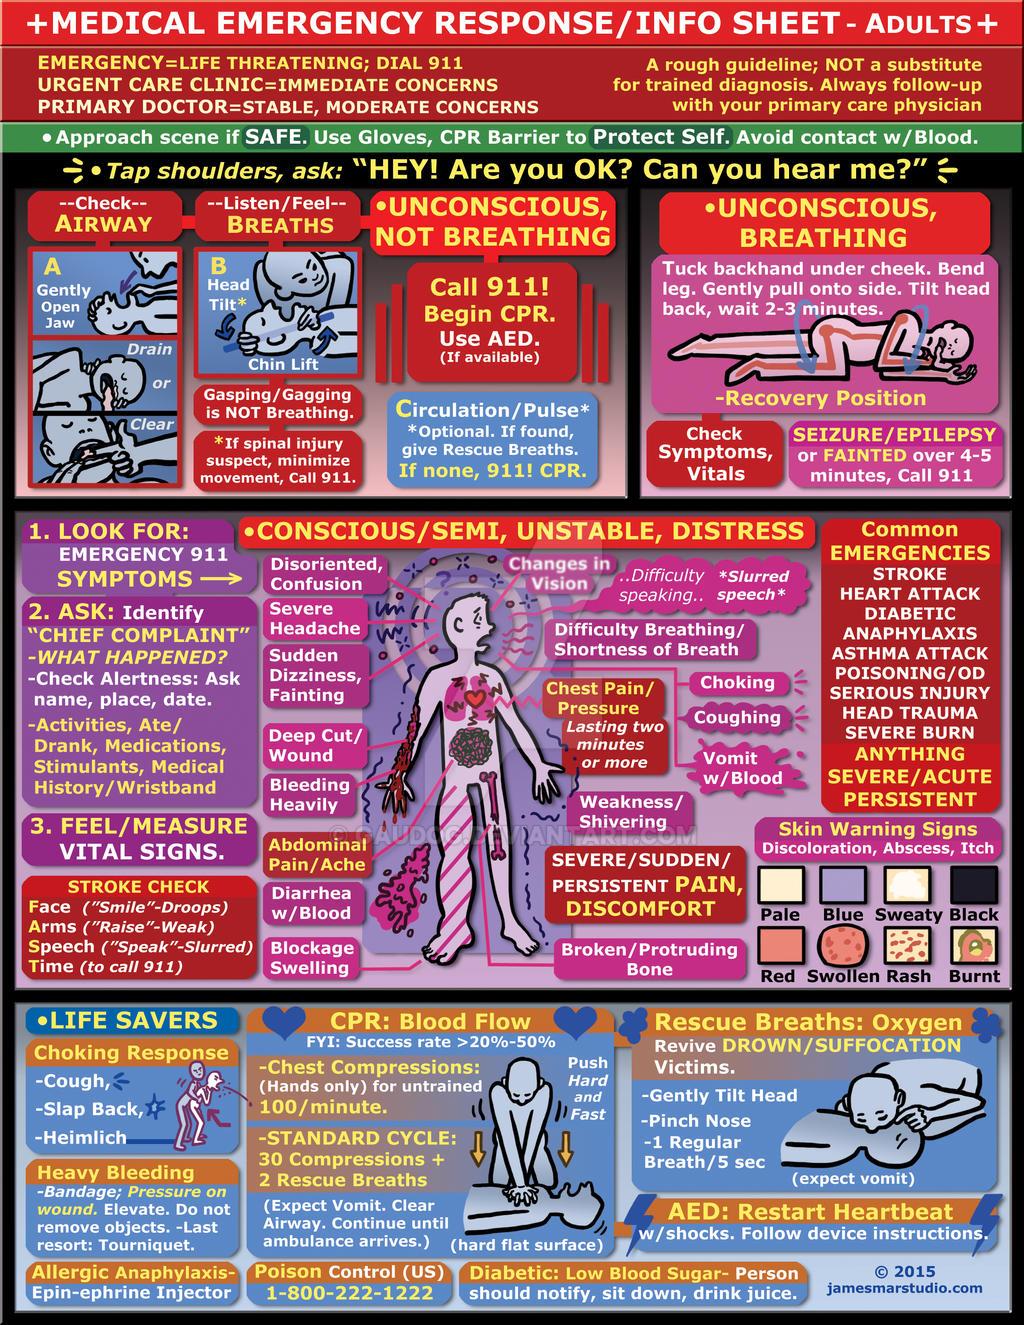 Emergency Response Info Sheet - Adults by gaudog